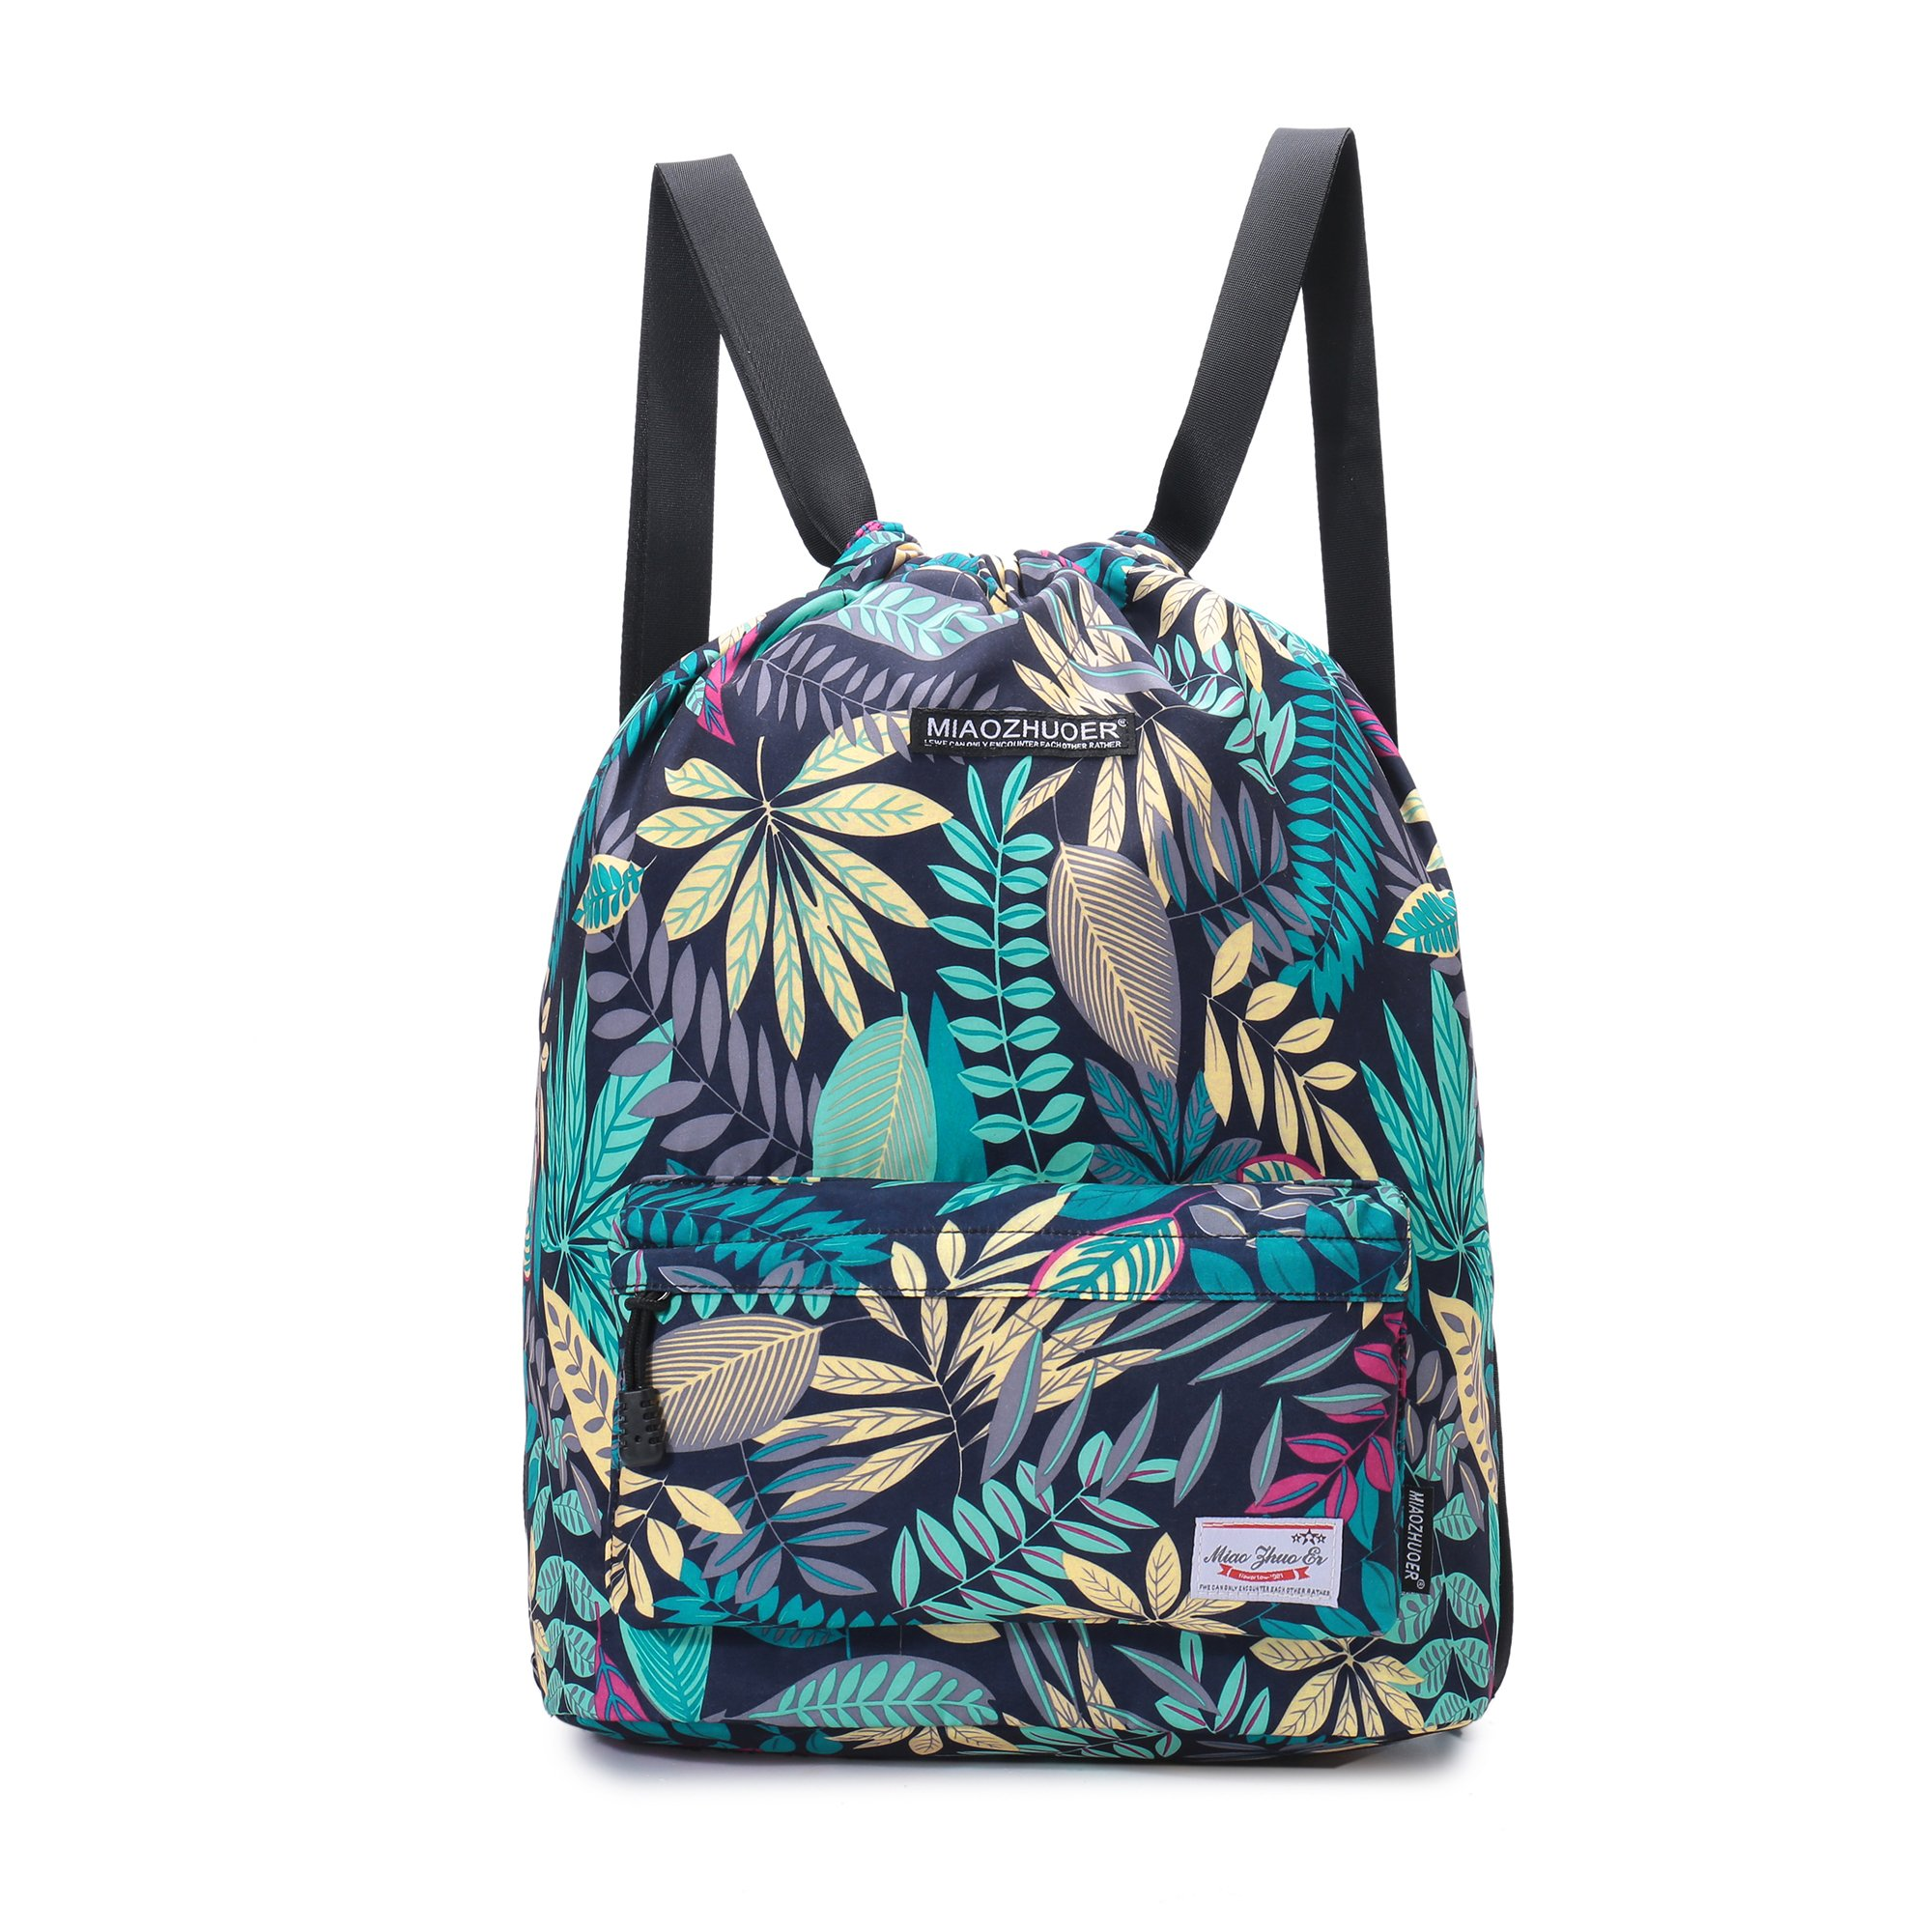 Yinjue Drawstring Backpack Lightweigh Gym Bag Floral Traver Bag for Women Gym Sackpack Yoga (Yellow44)